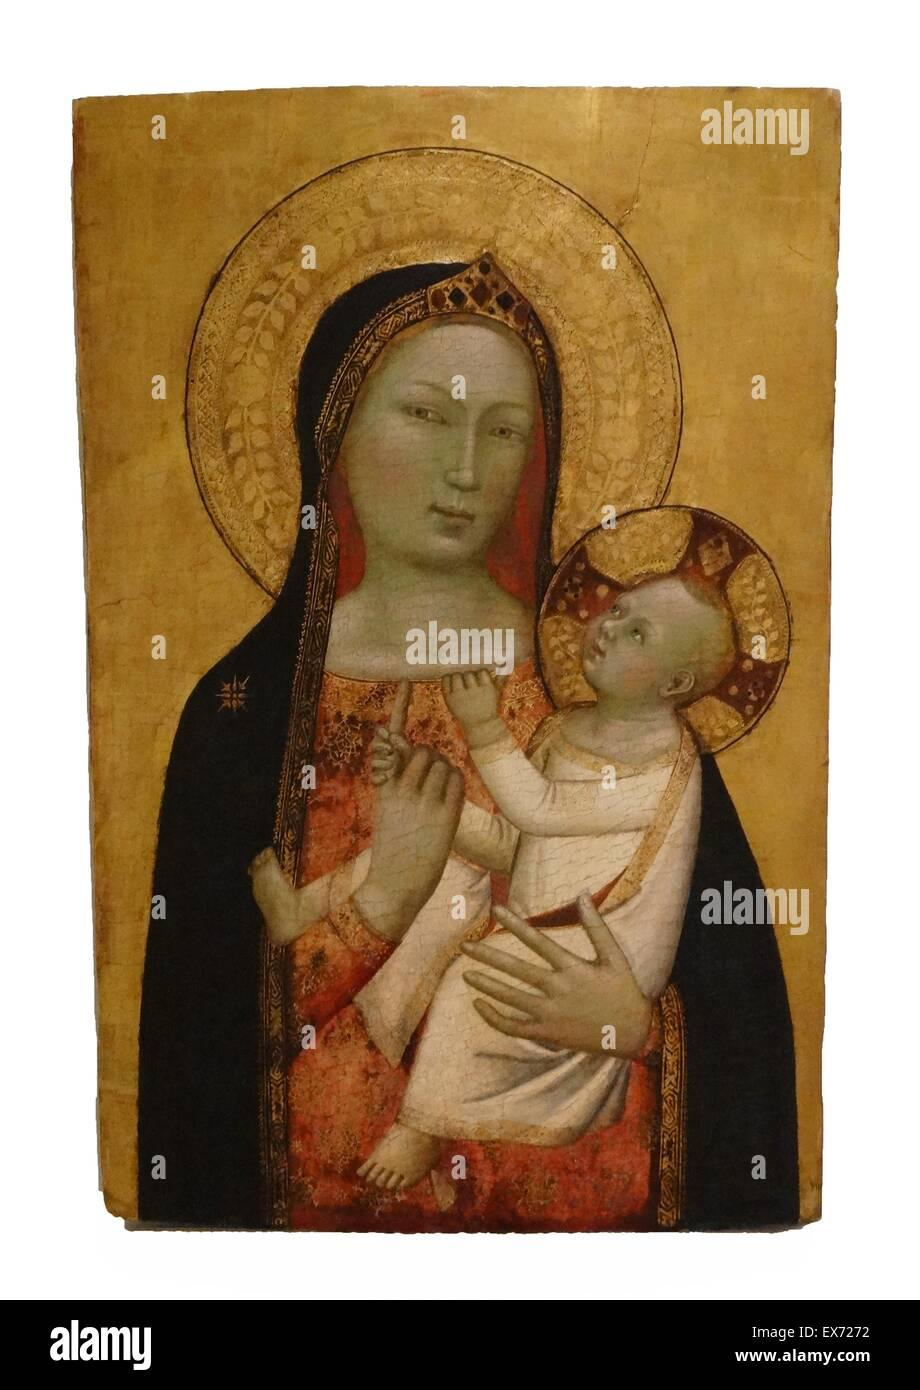 Bernardo Daddi 1312 — 1348. Virgin and Child 1340-1345. tempera and gilded